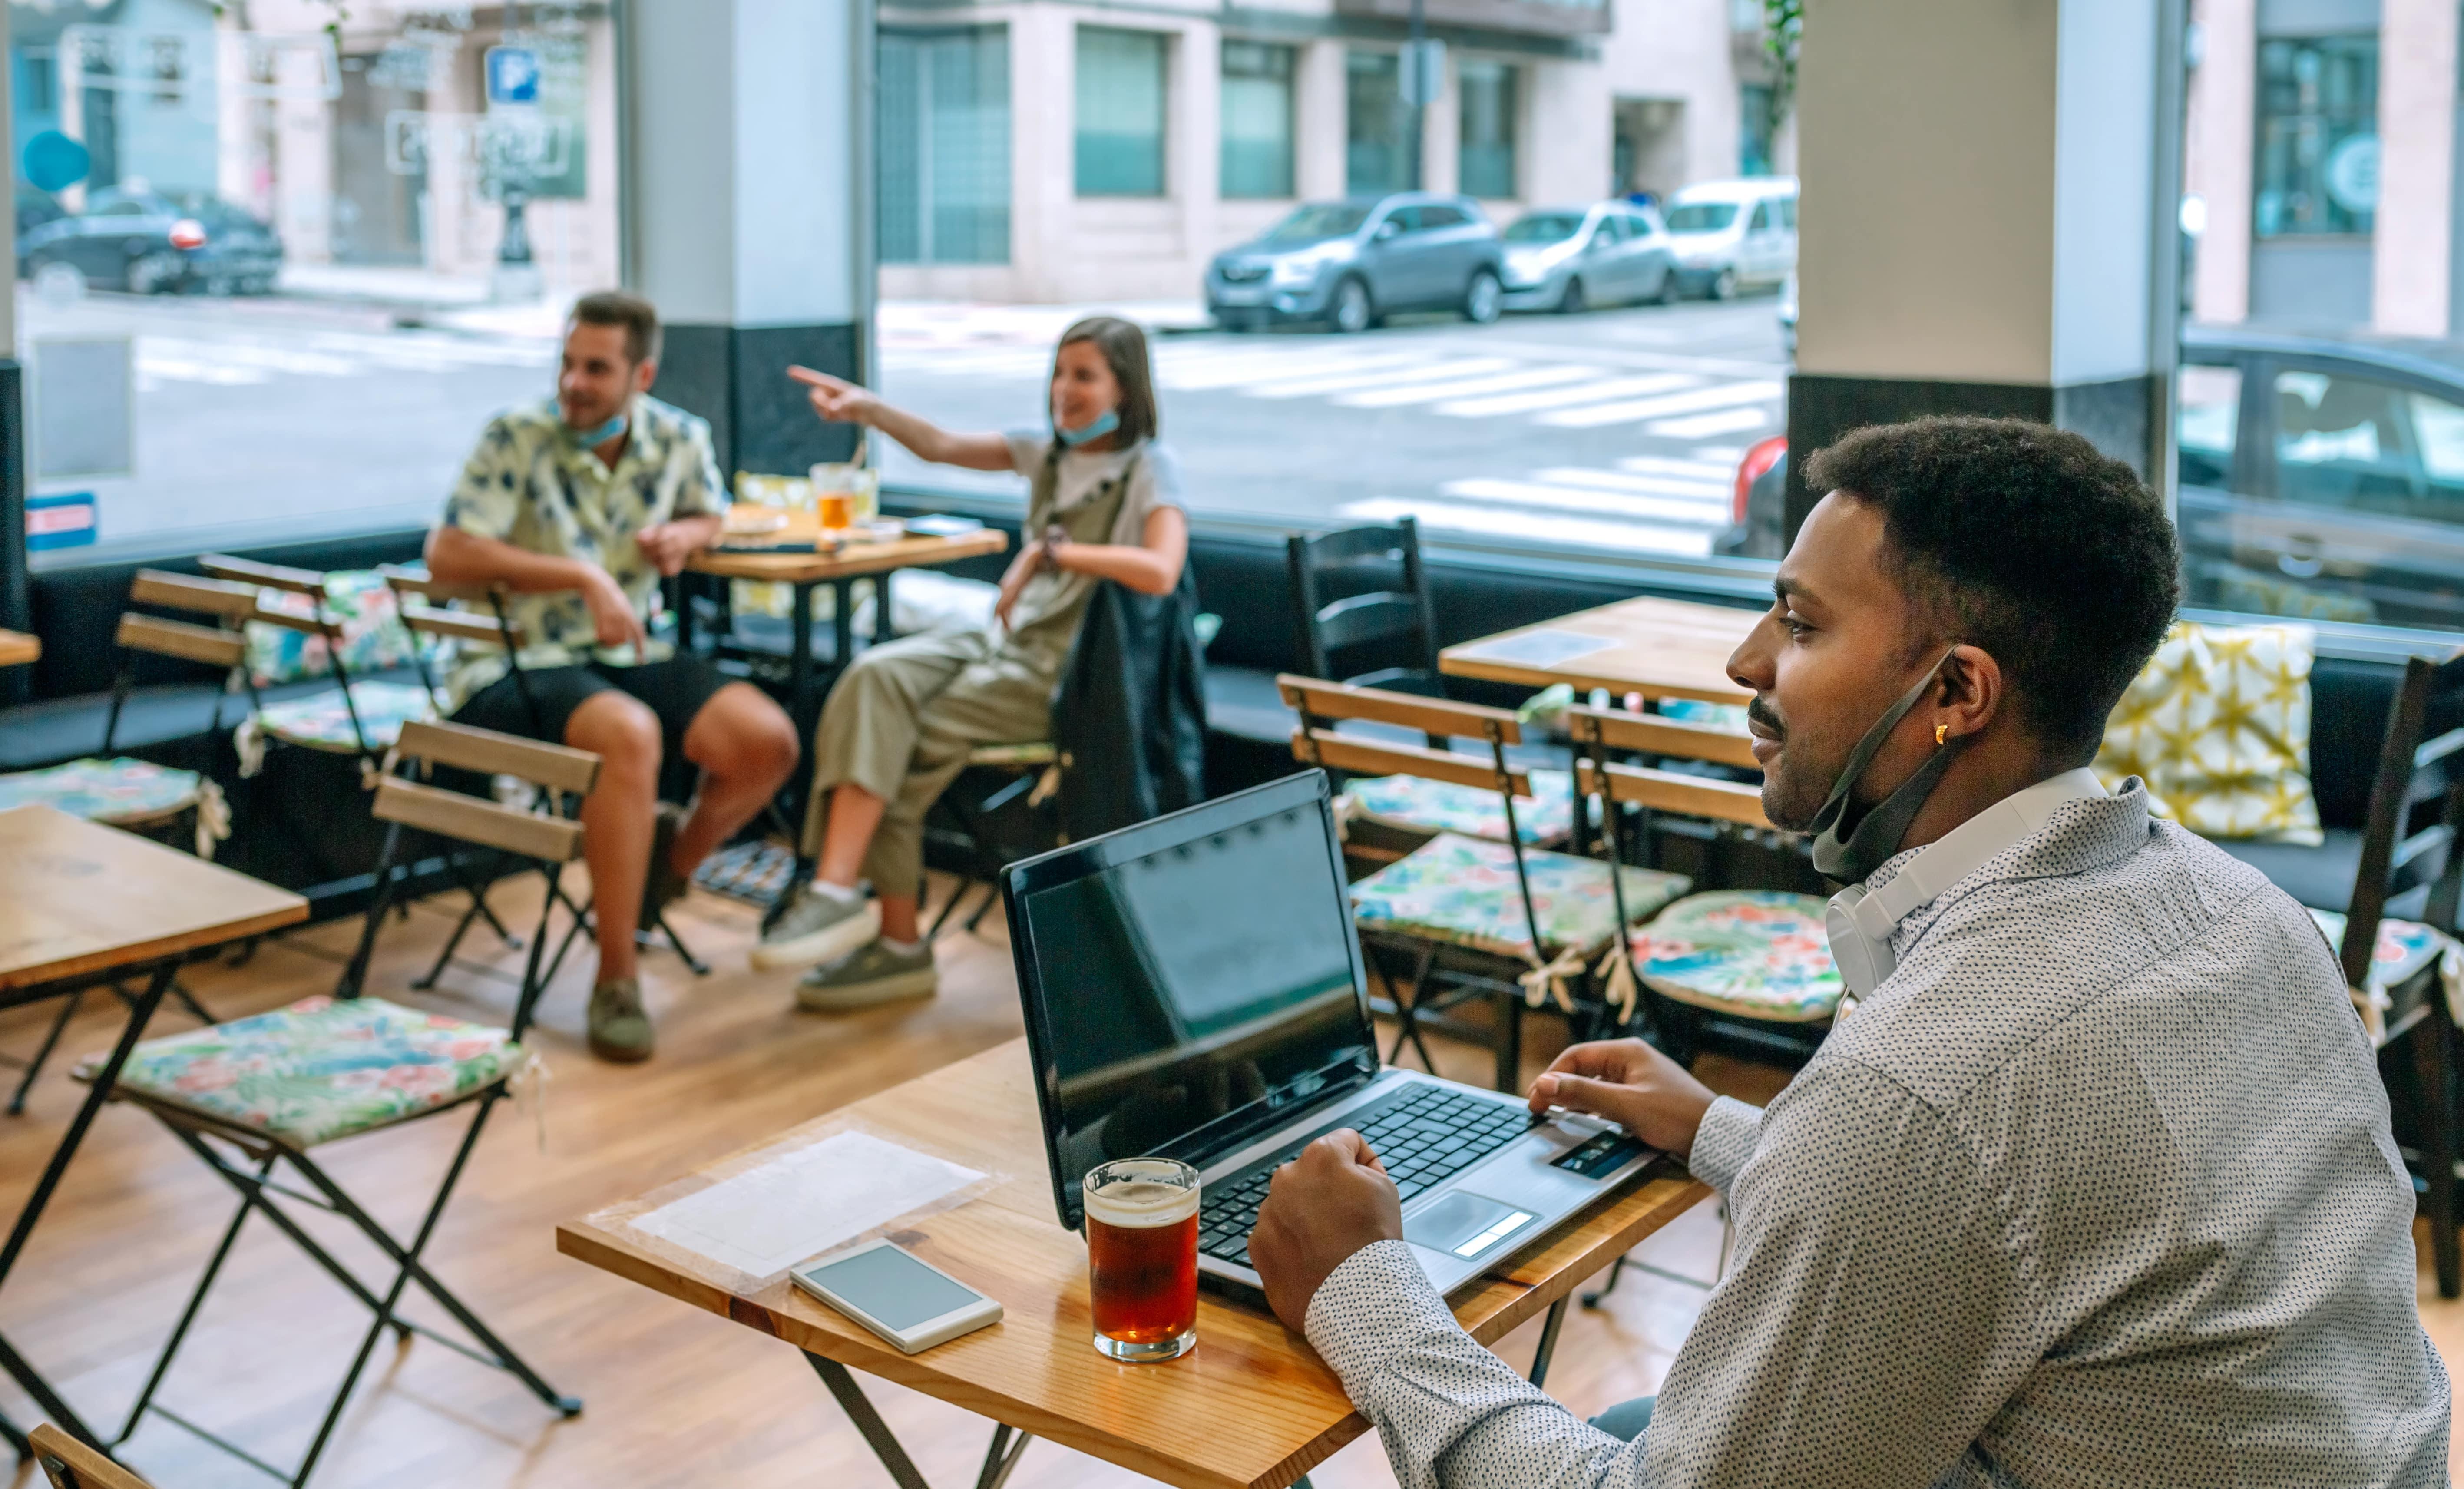 man-teleworking-with-laptop-in-coffee-shop-UAGRDRA-min